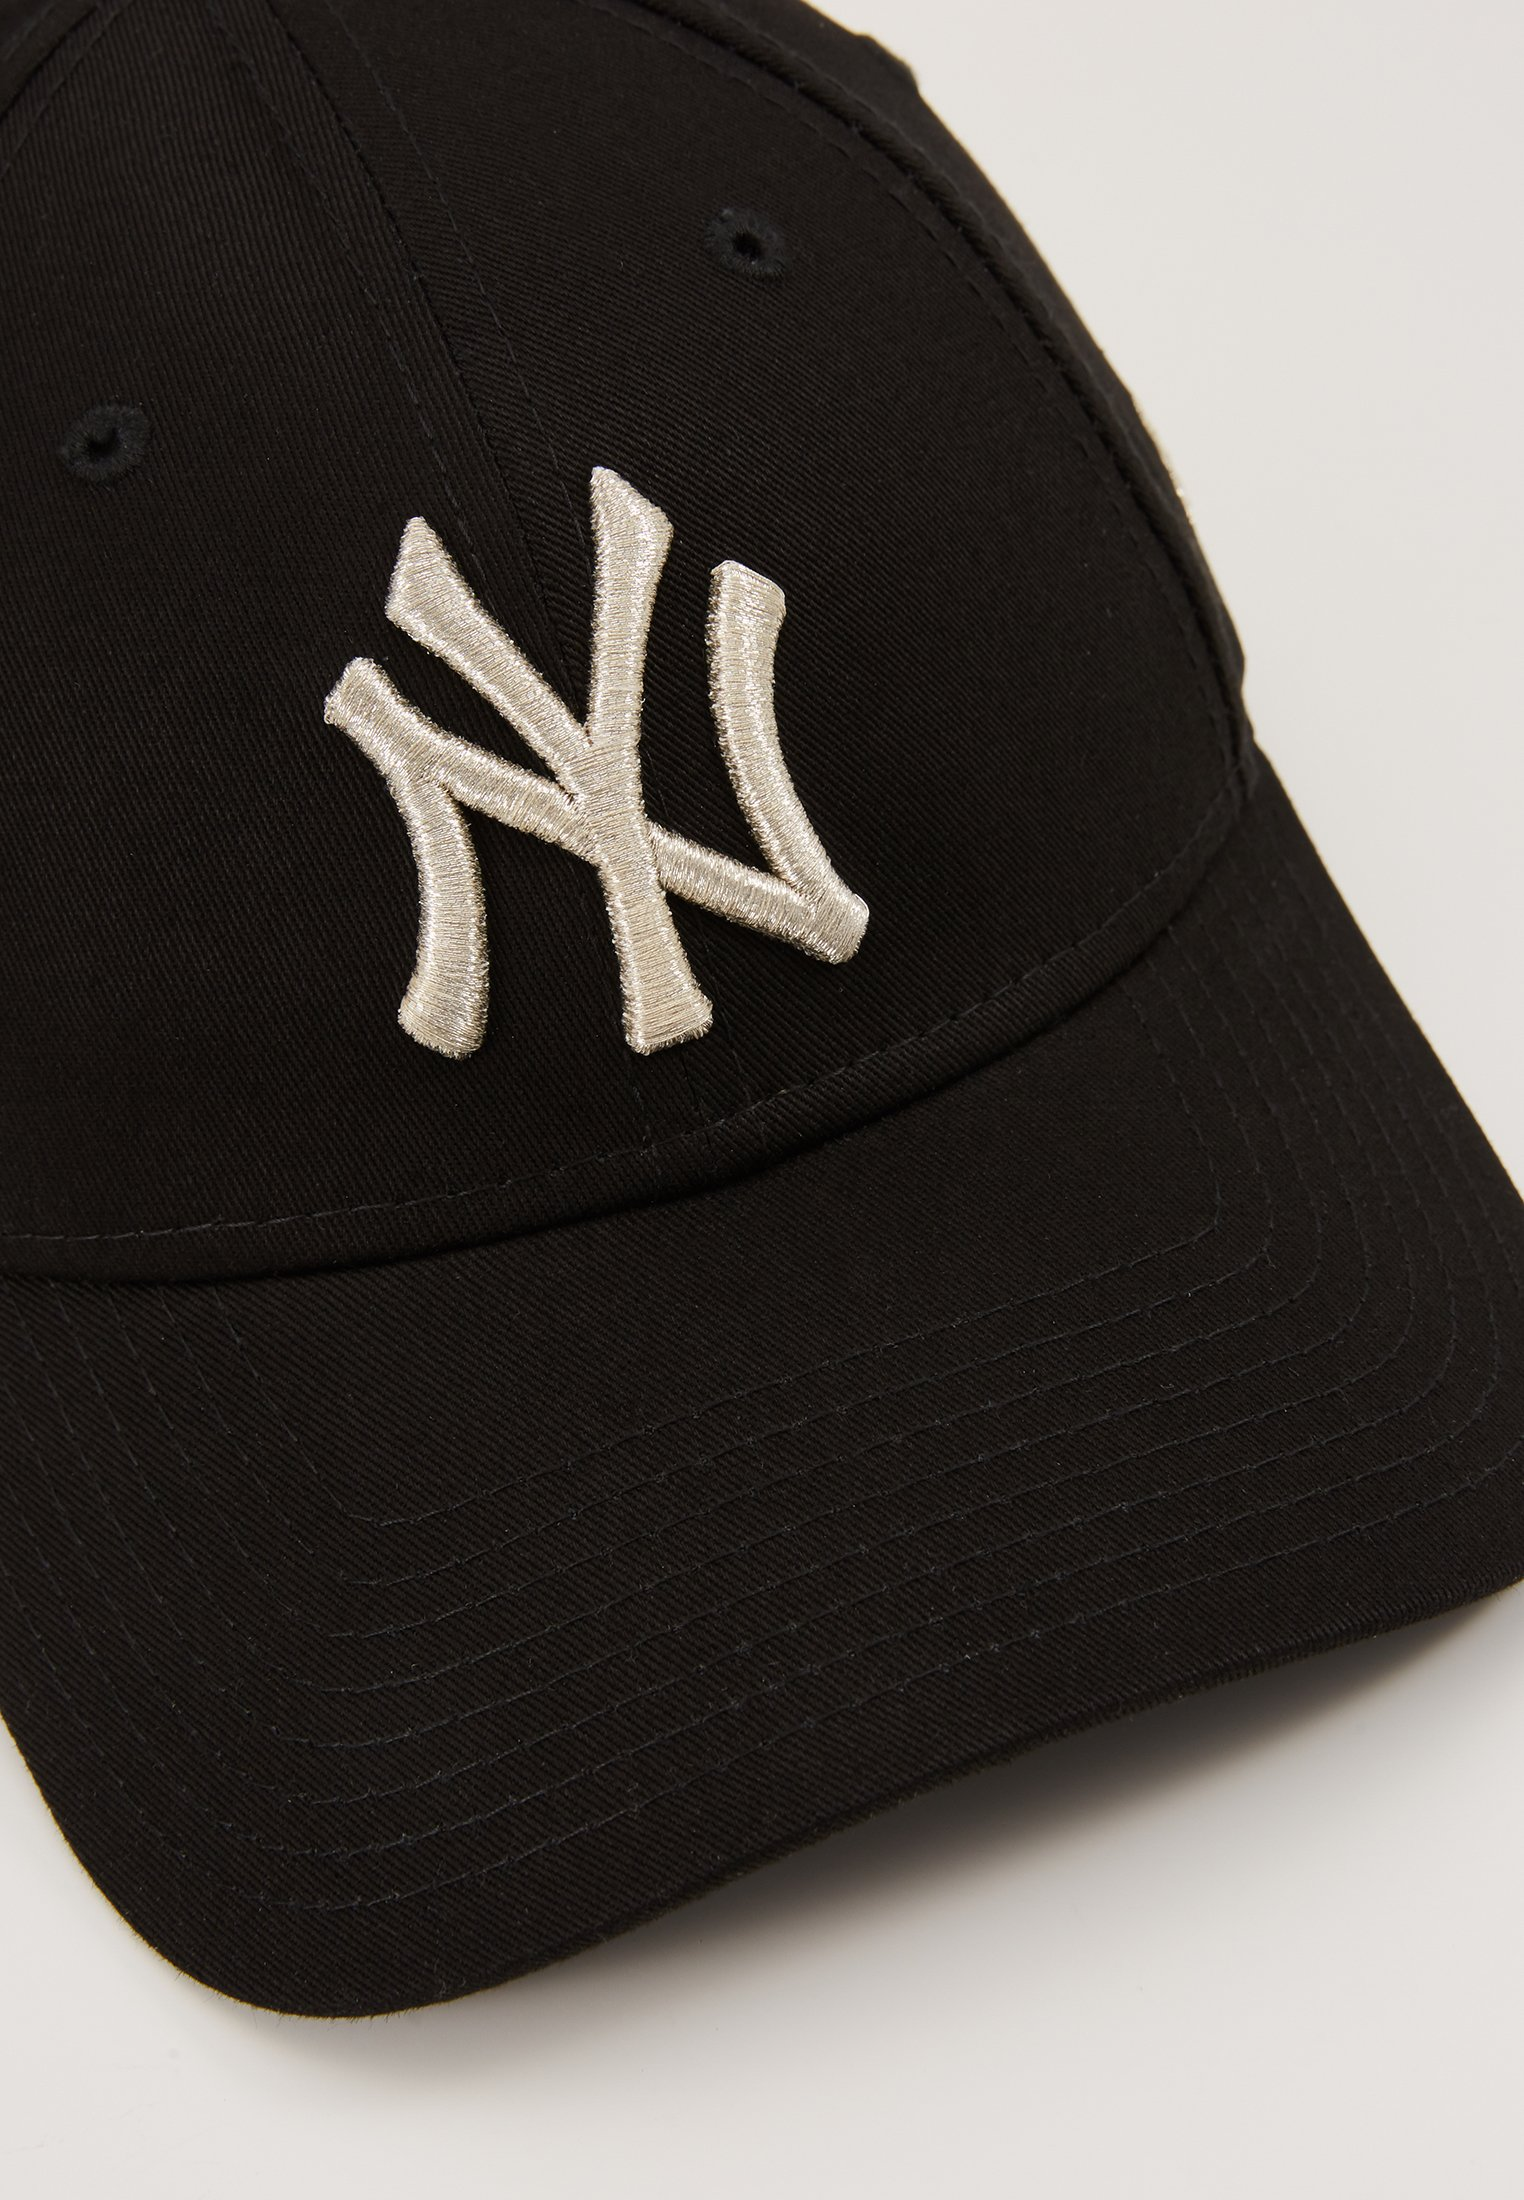 New Era FEMALE WMNS METALLIC 9FORTY - Caps - new york yankees blk